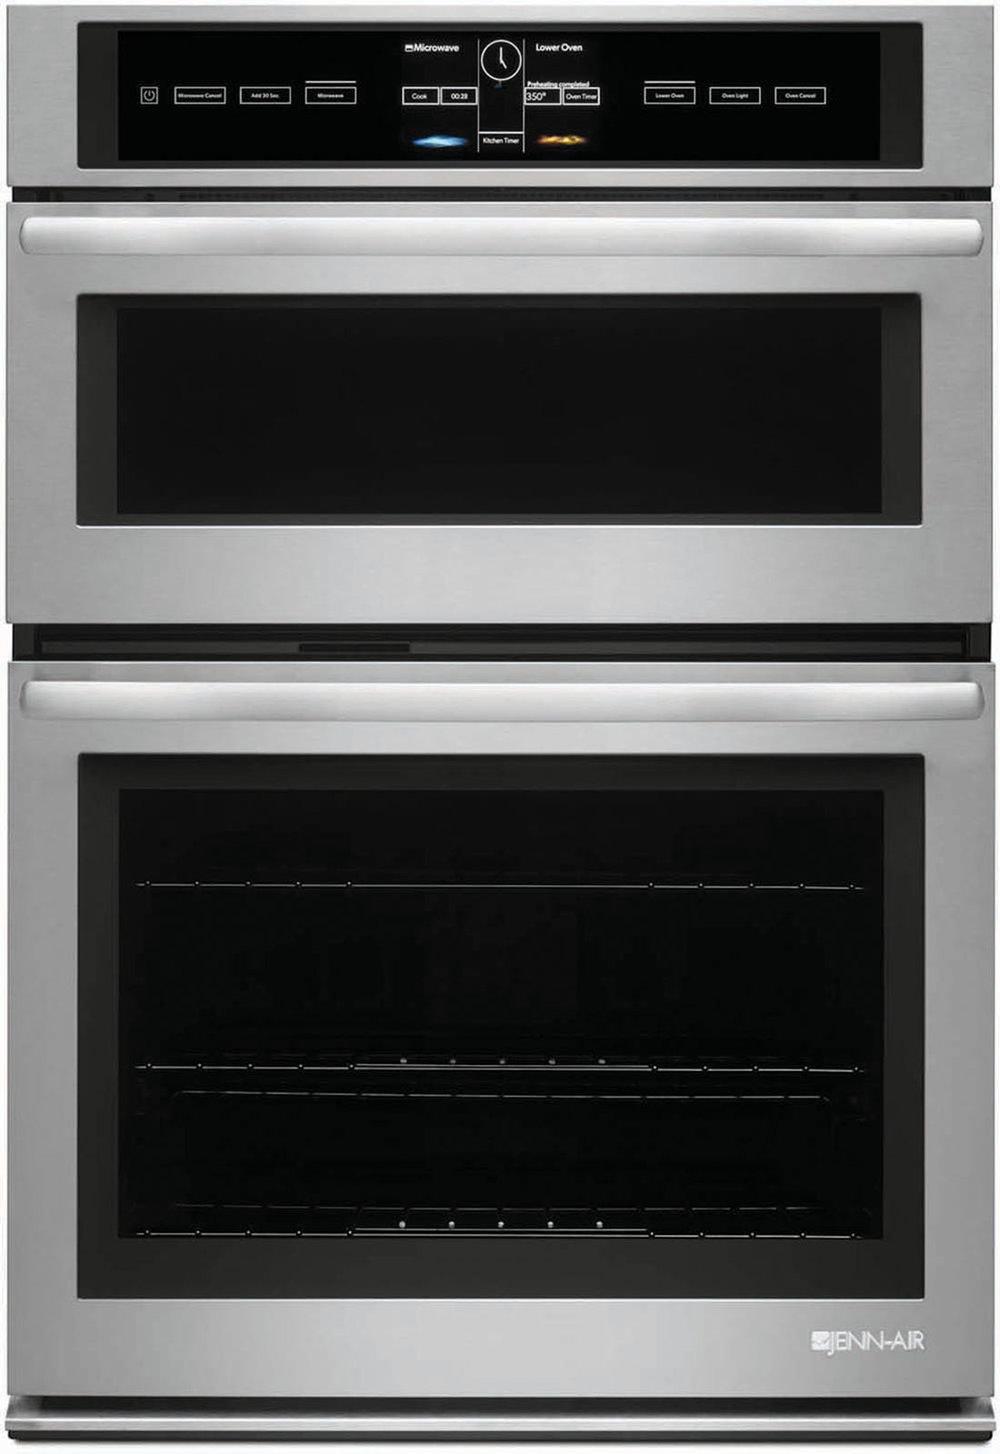 嵌入式微波爐、雙風扇電烤箱 At Trail Appliances, (604) 278-6133, jennairblack.ca